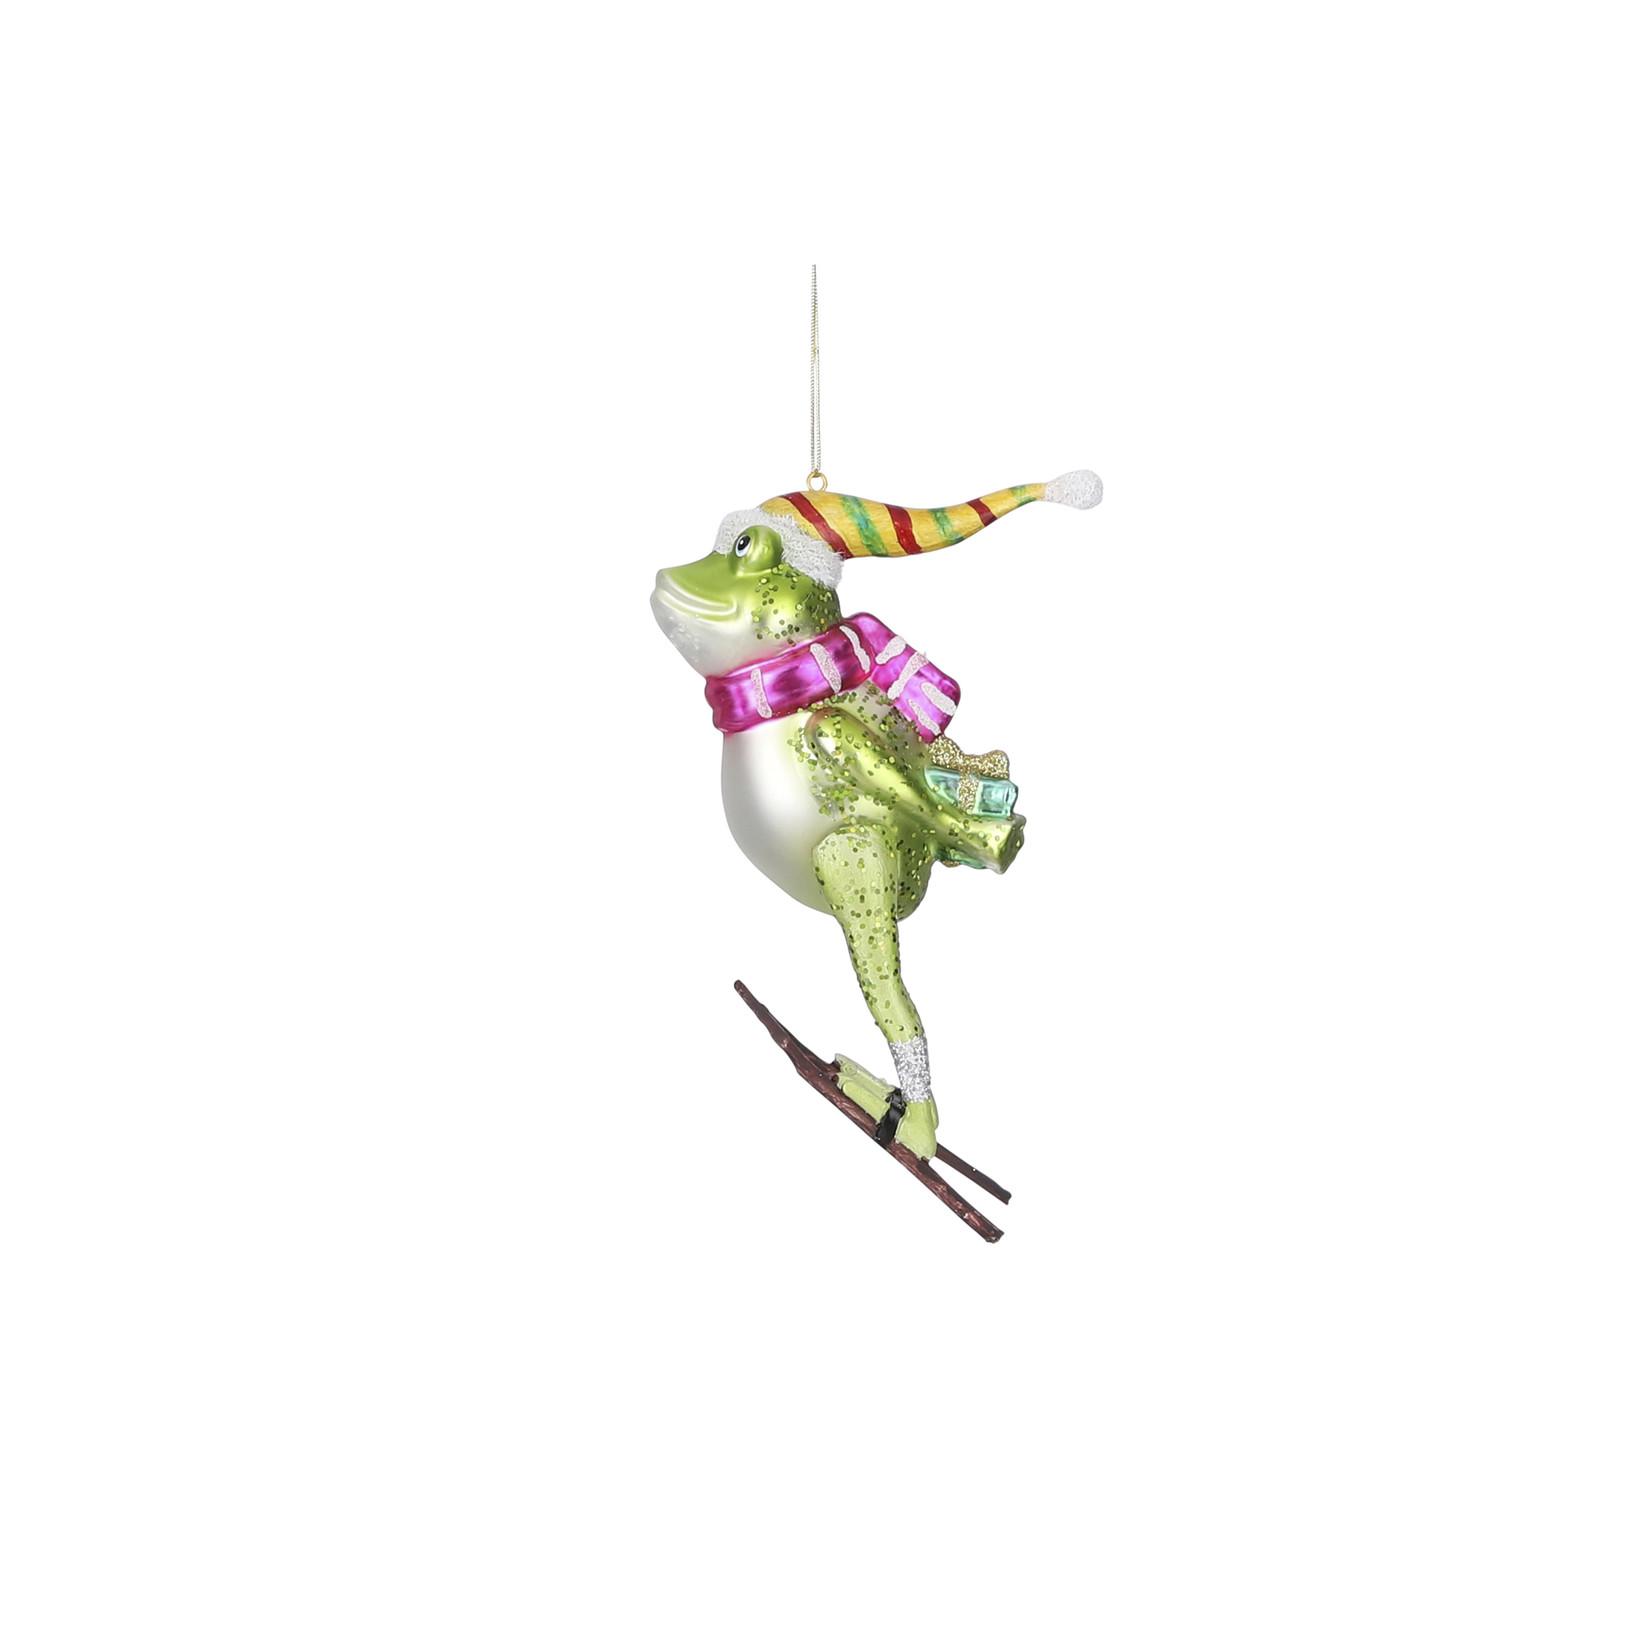 House of Seasons Ornament kikker groen